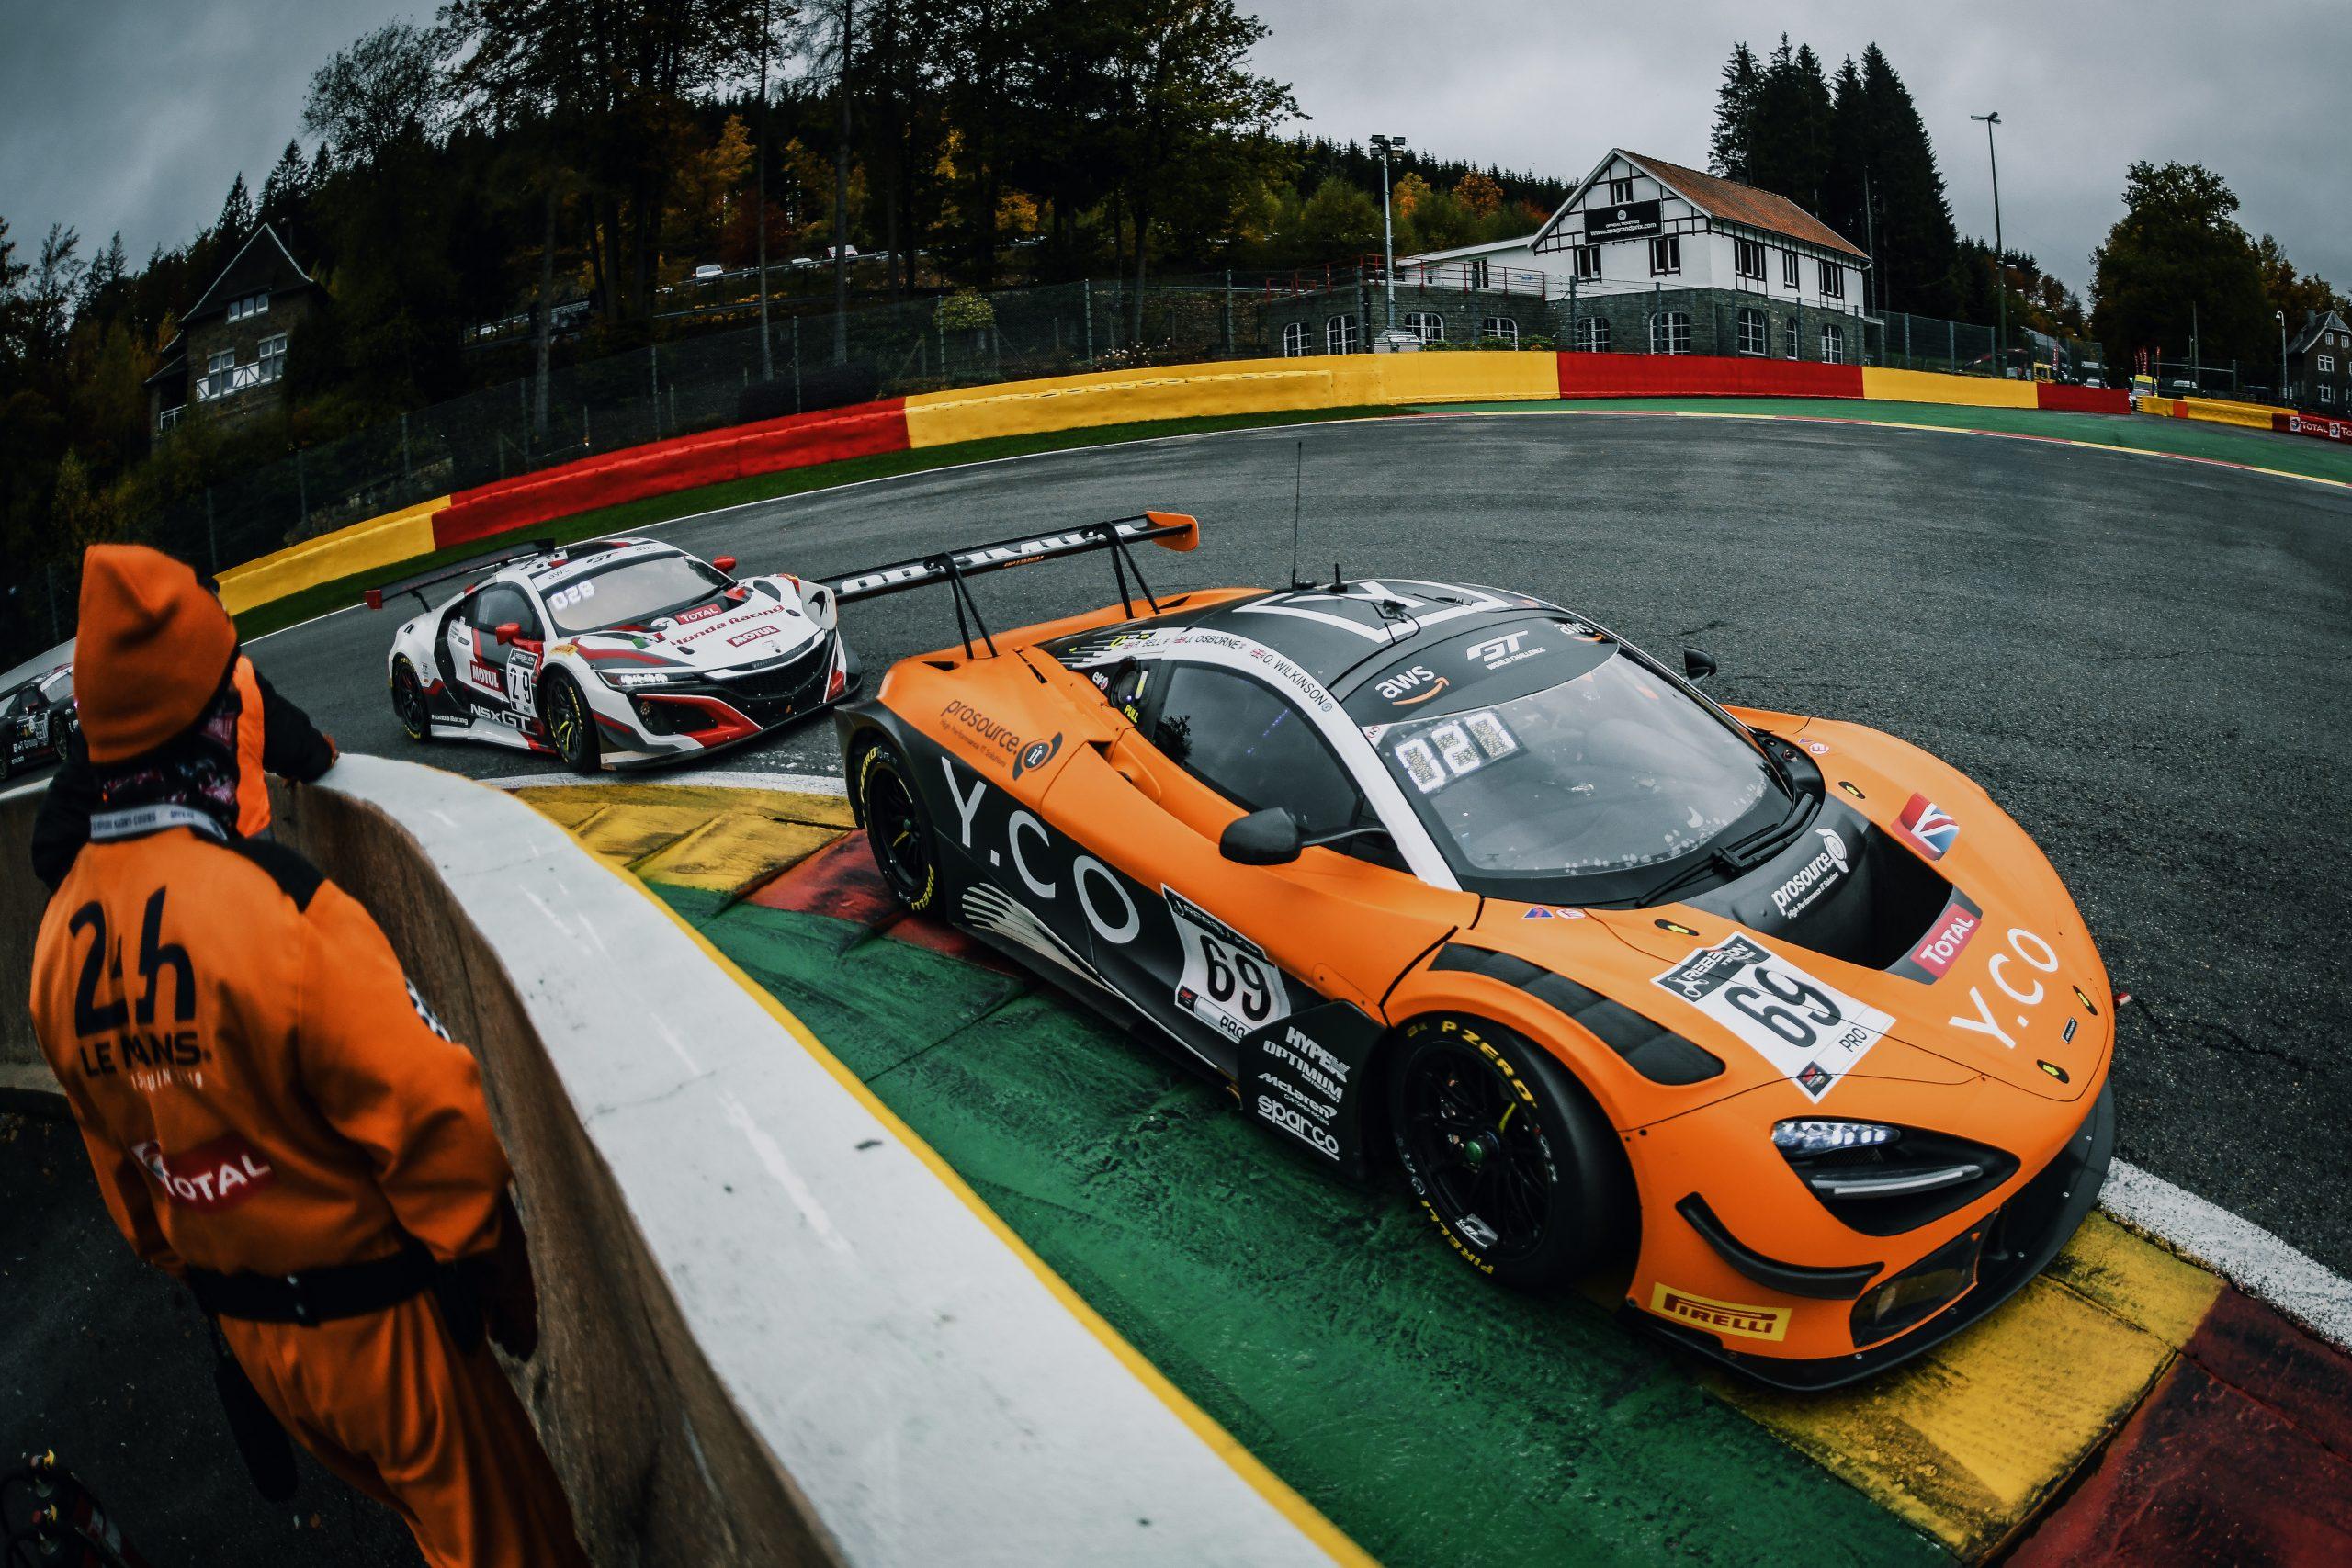 2020 – GT World Challenge Europe Endurance Cup, McLaren 720S GT3